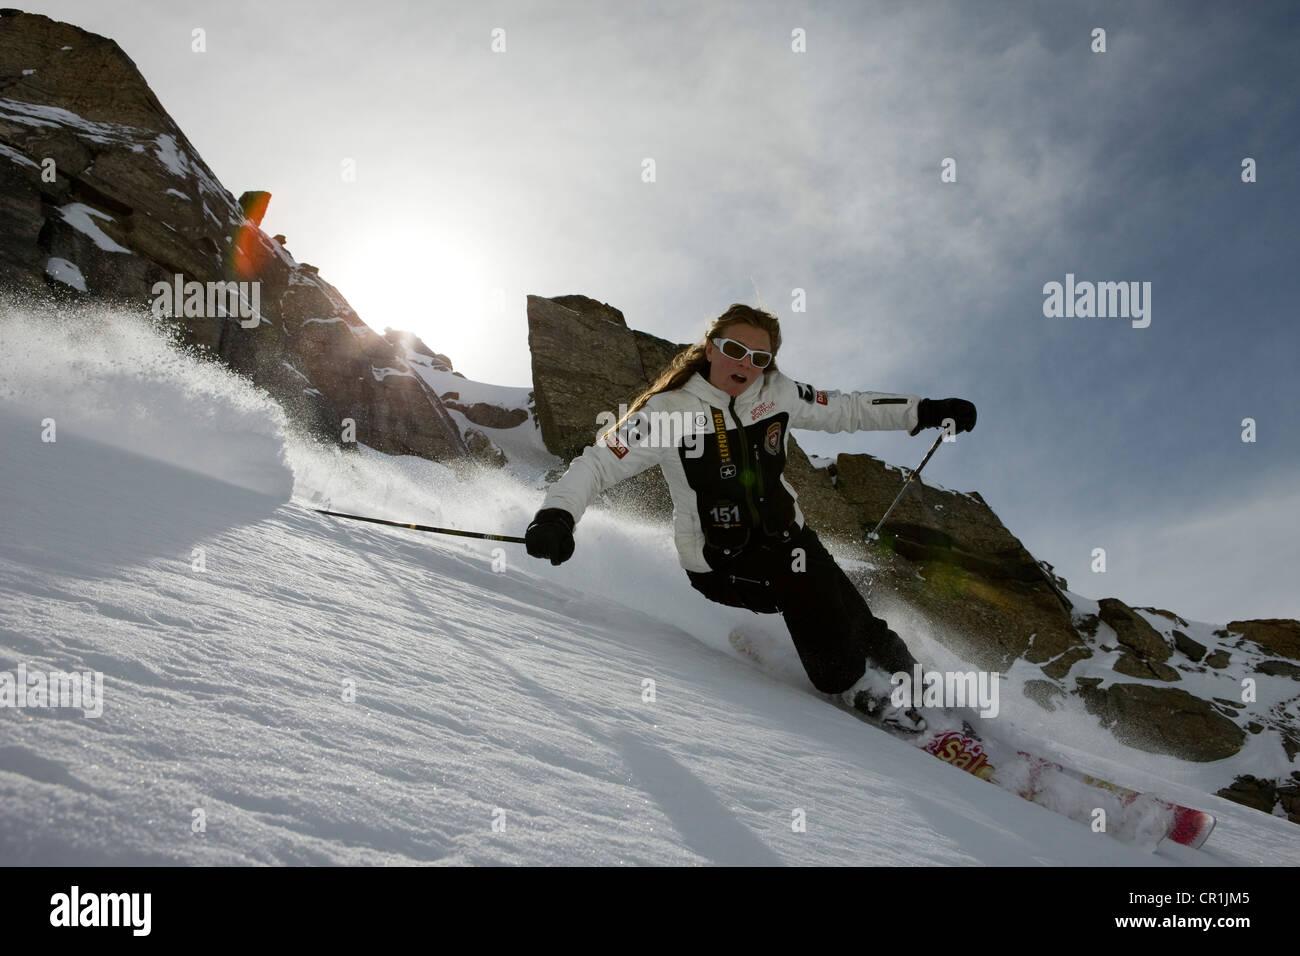 France, Savoie, Meribel, Val Thorens, off-piste skiing Stock Photo